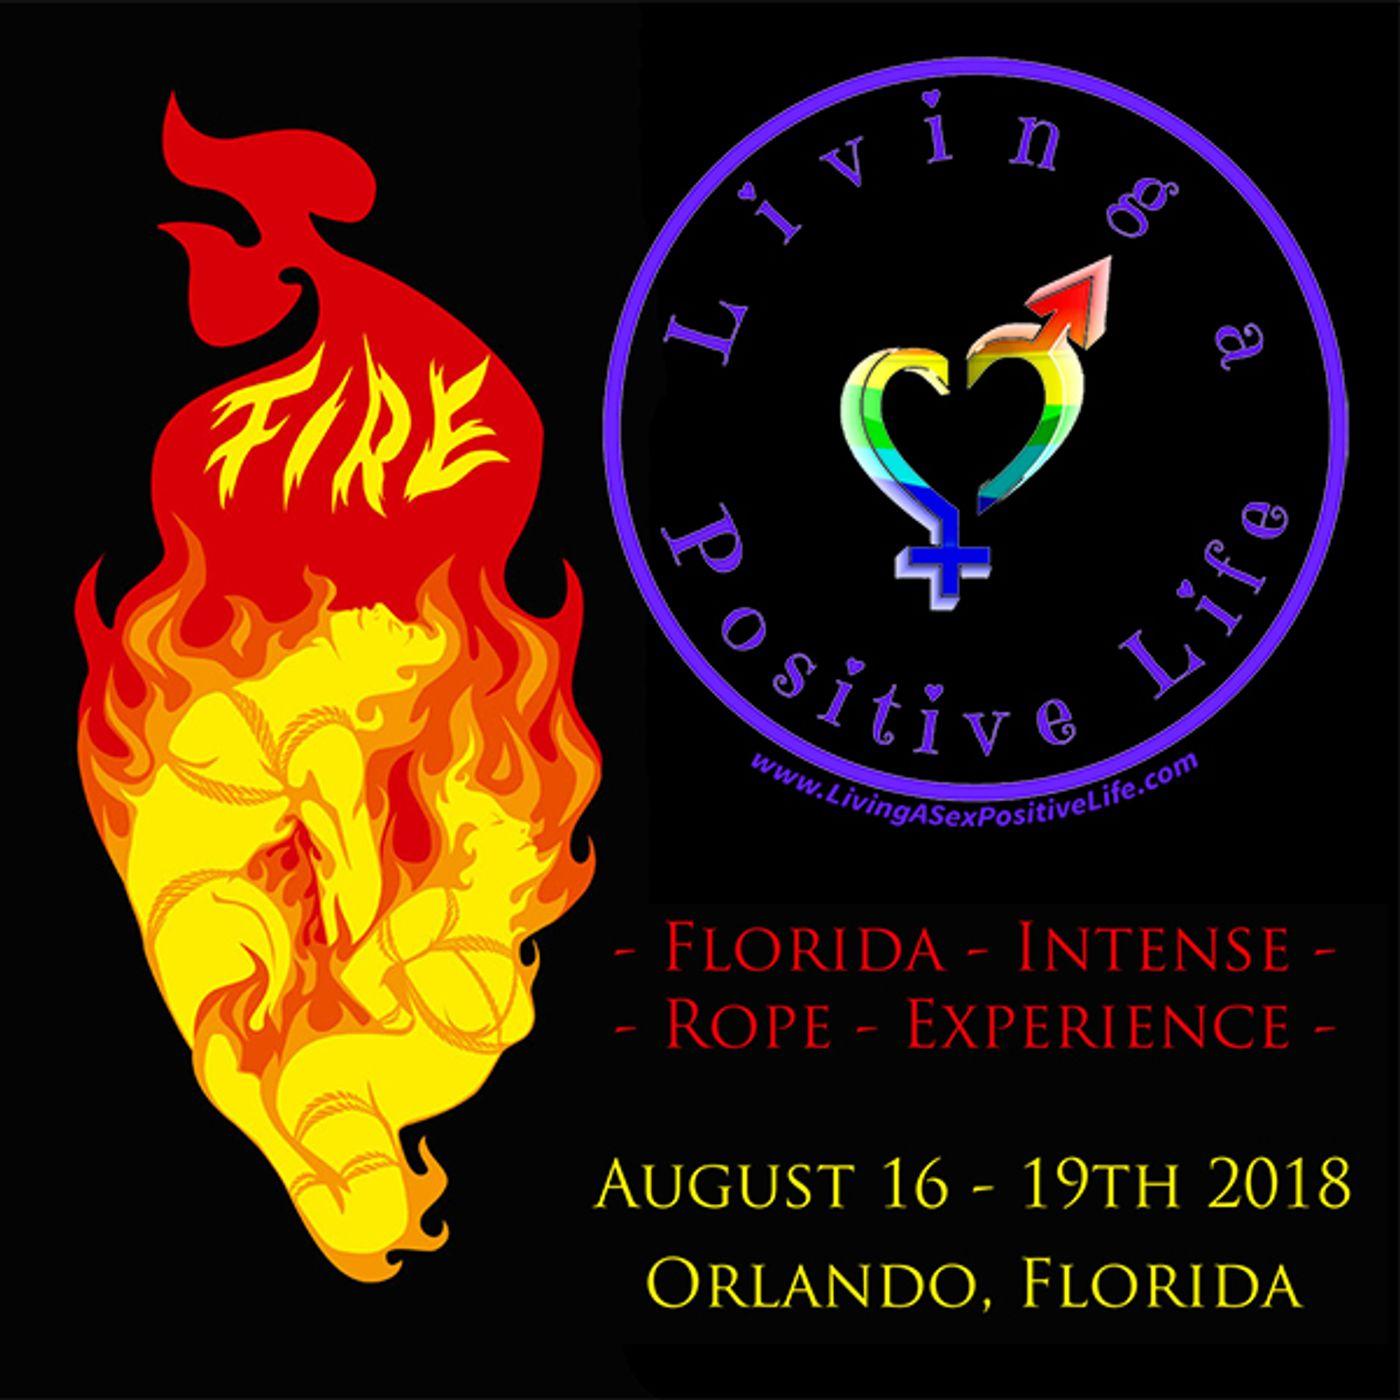 Sex Positive Me - E41 - F.I.R.E, Florida Intense Rope Experience